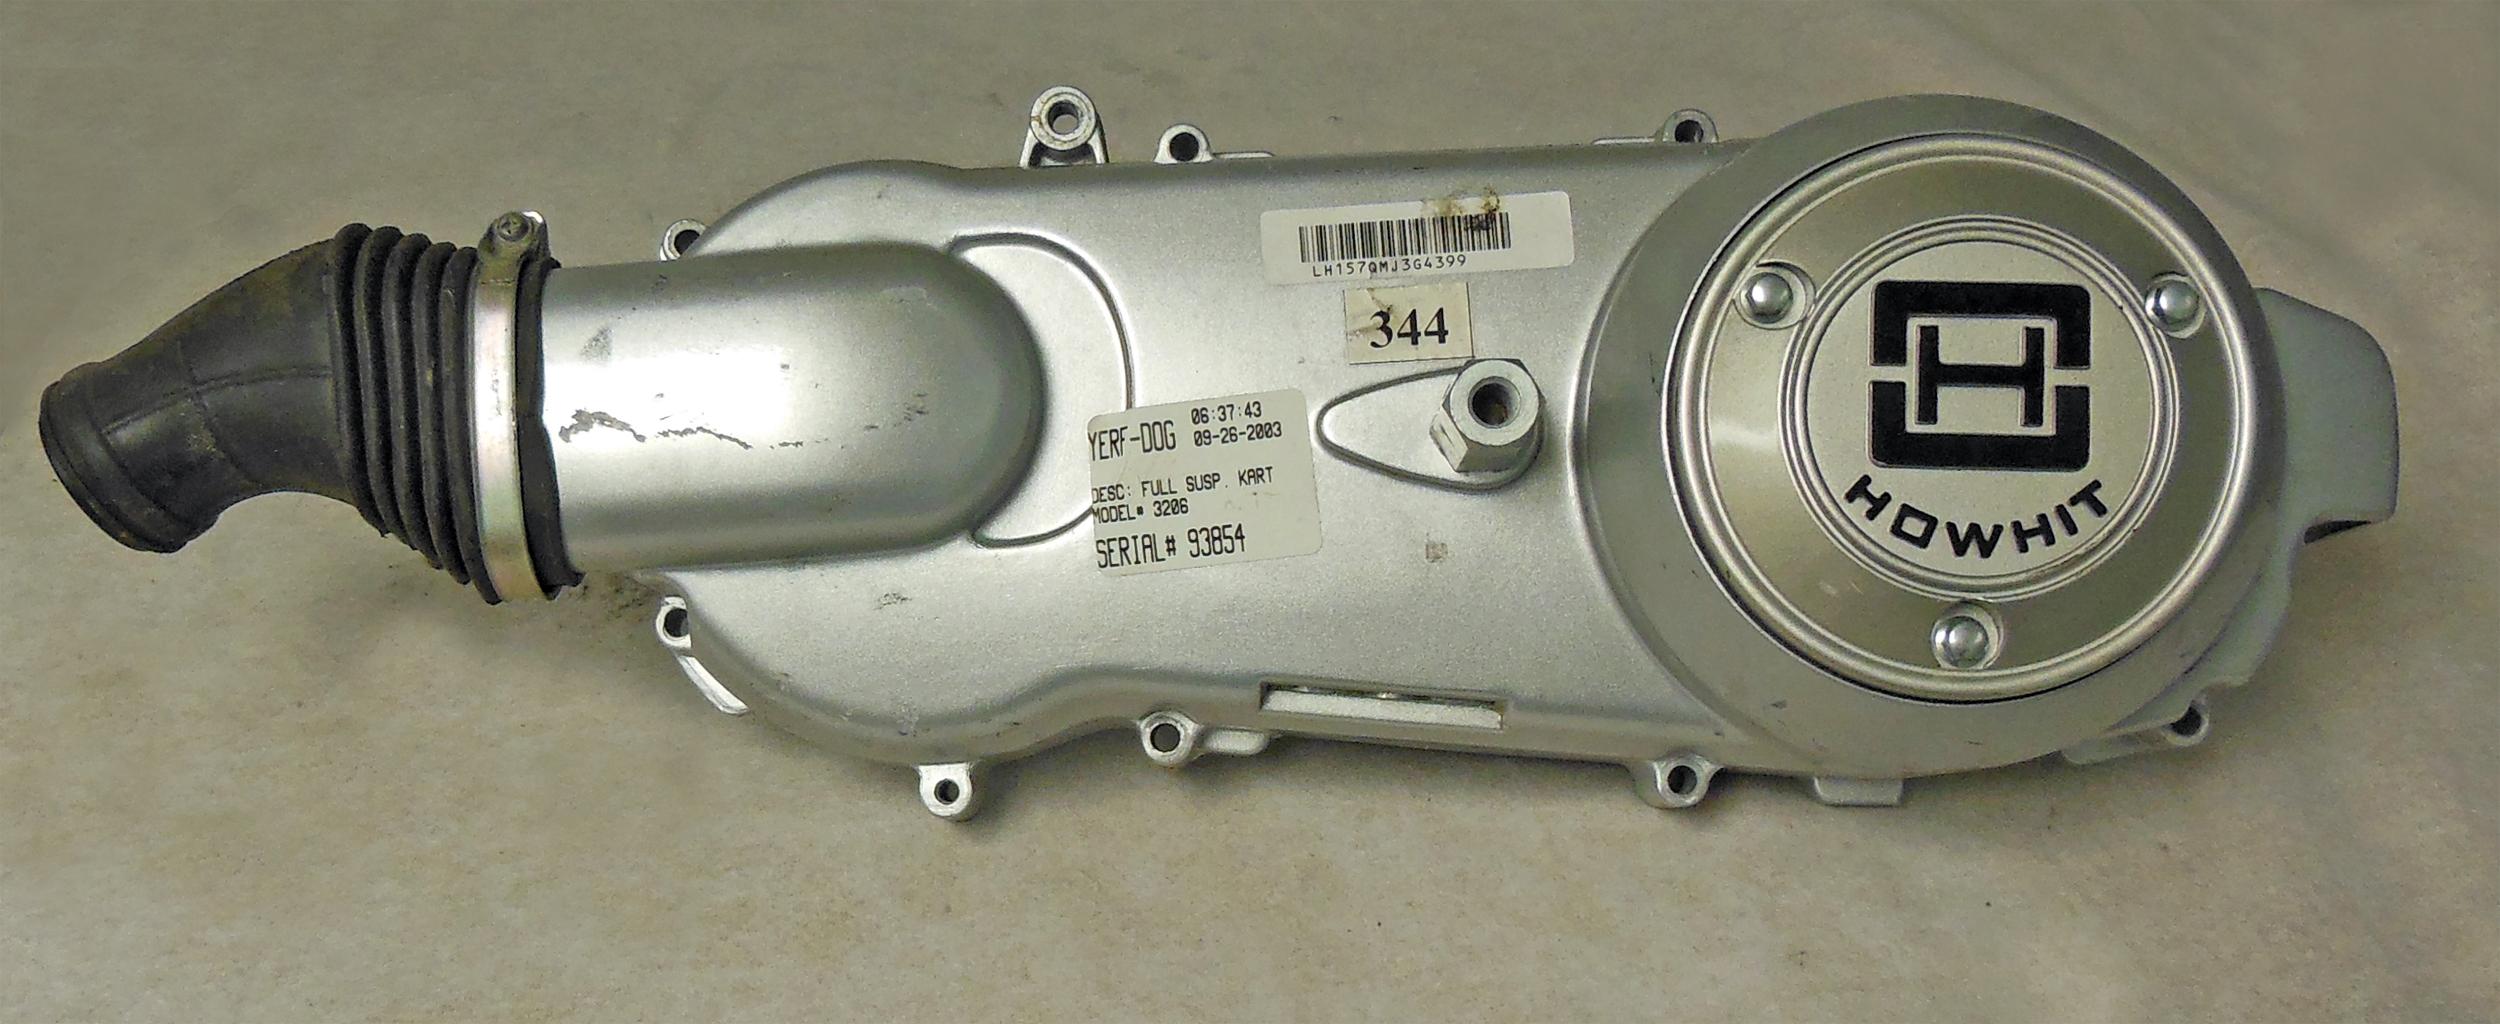 Cu on Yerf Dog 150cc Engine